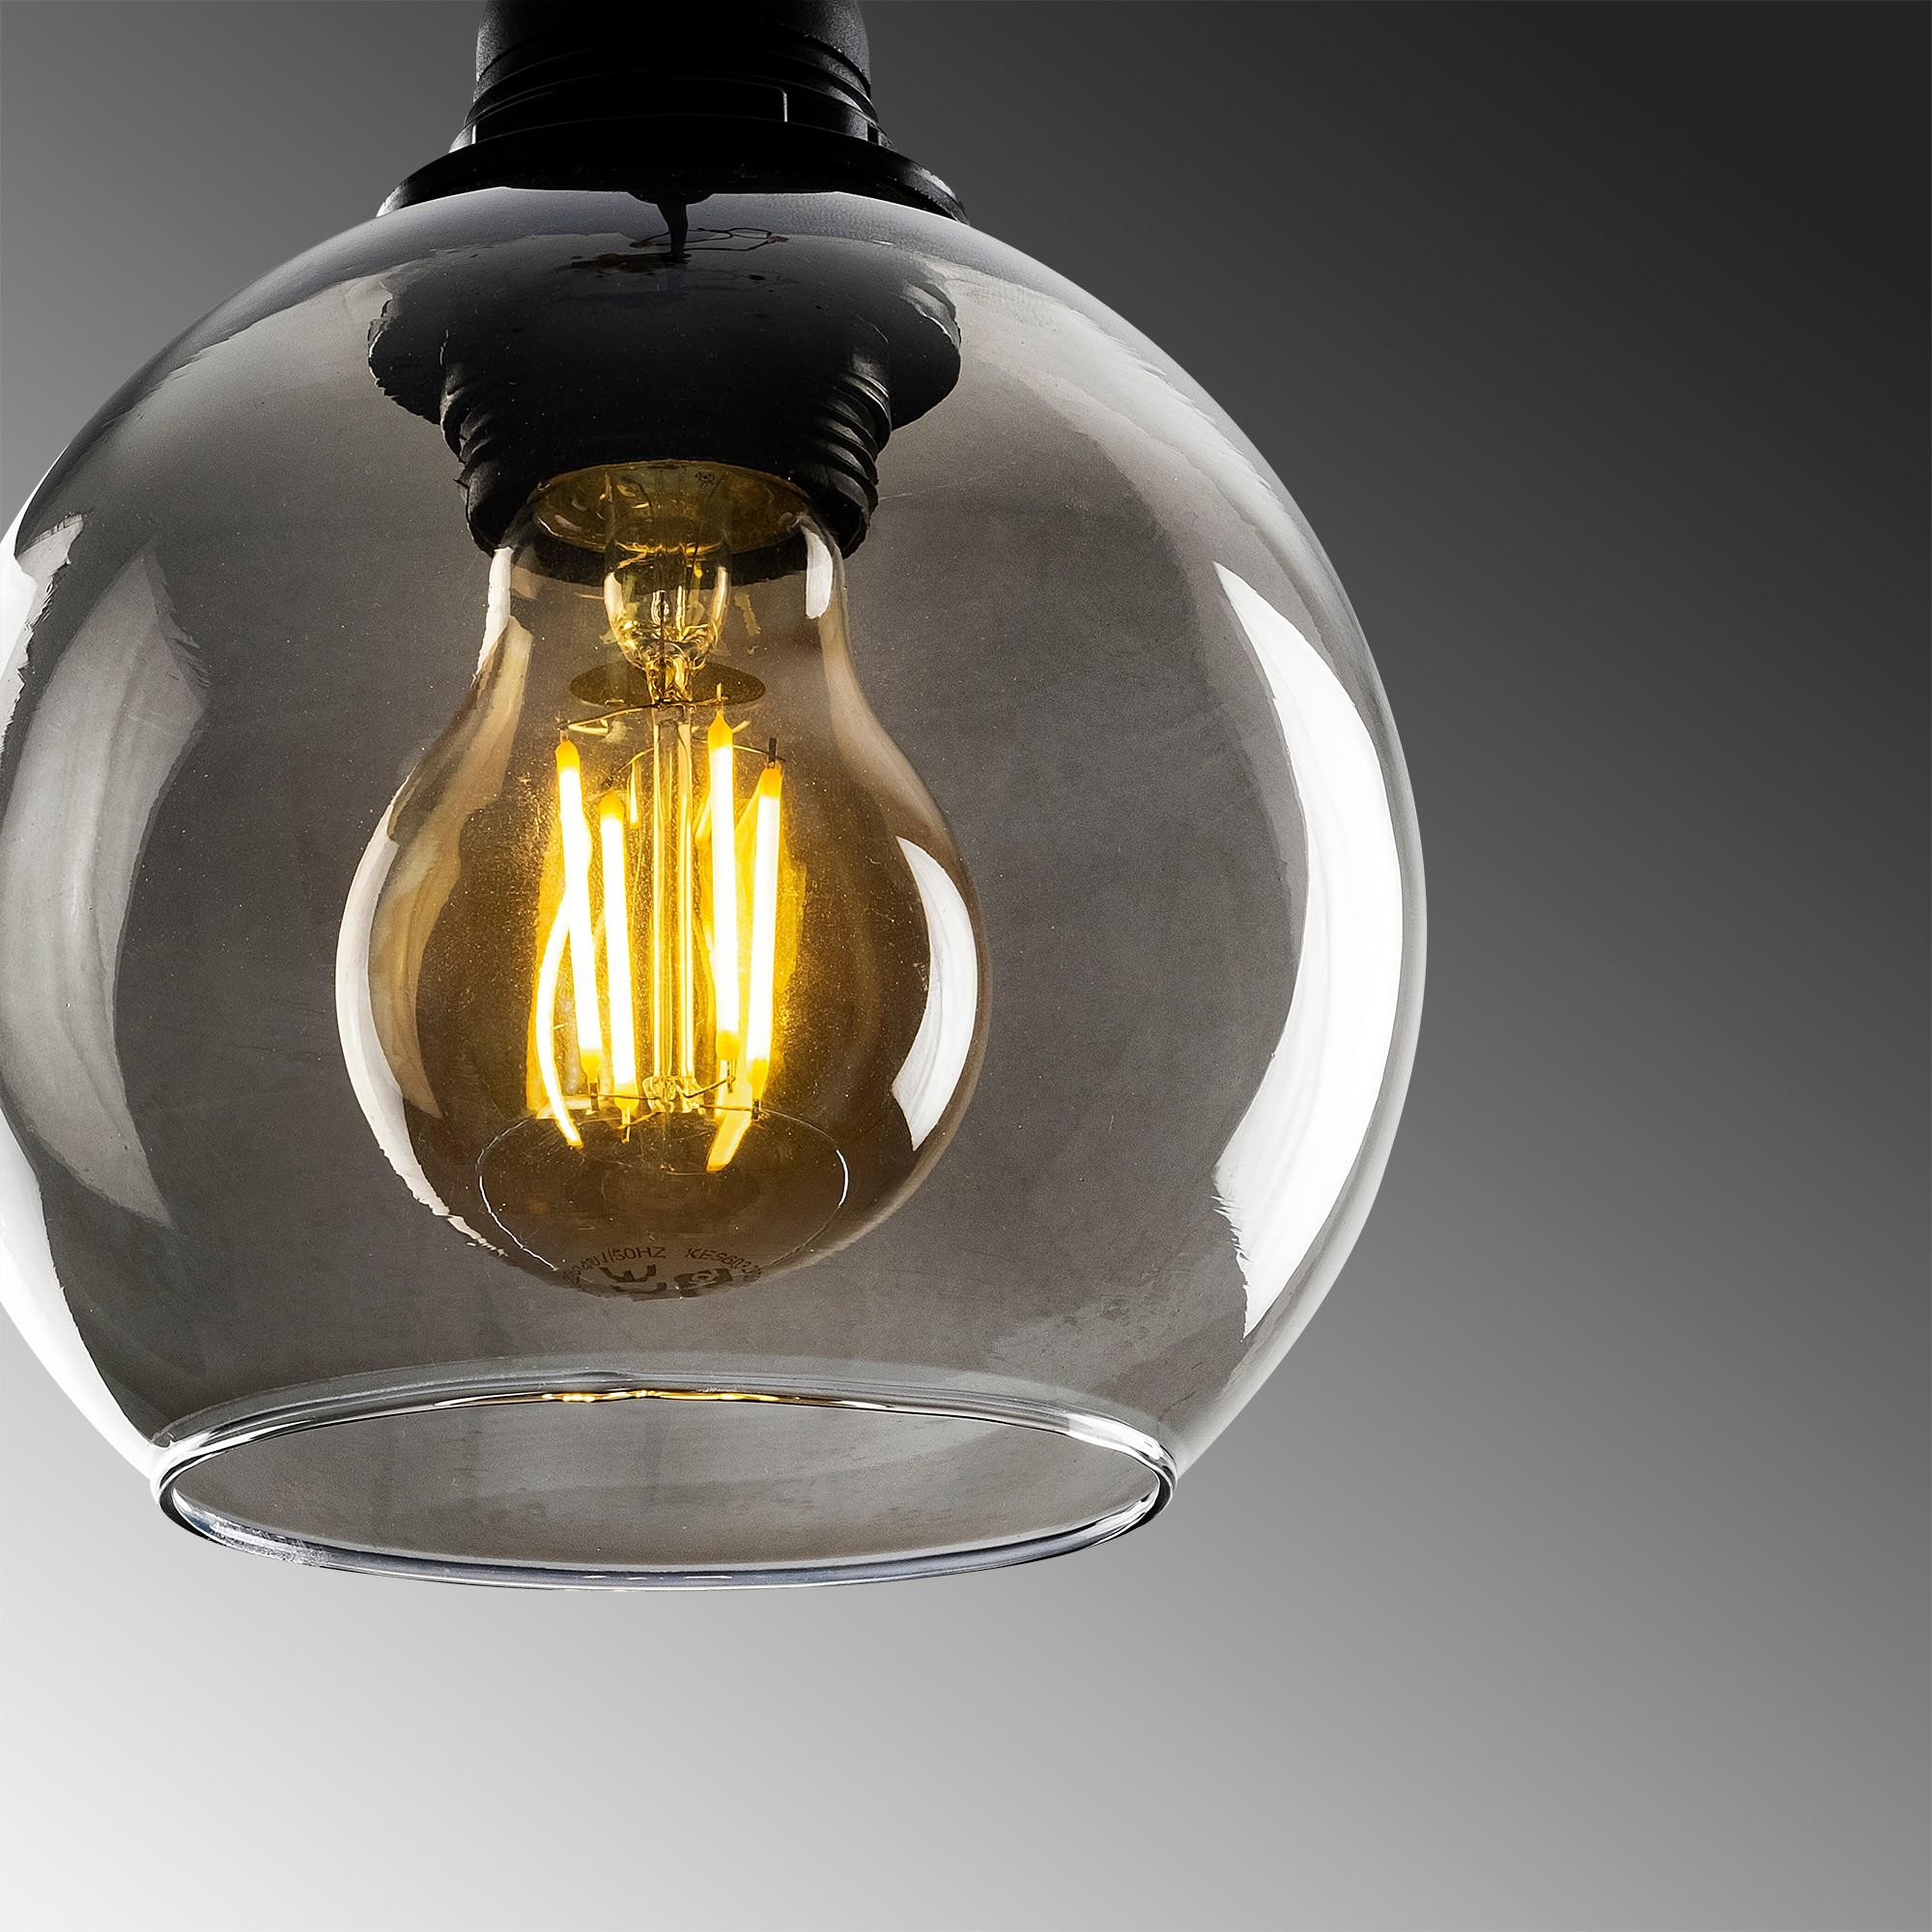 Hanglamp gerookt glas zwart 1 x E27 fitting - close-up